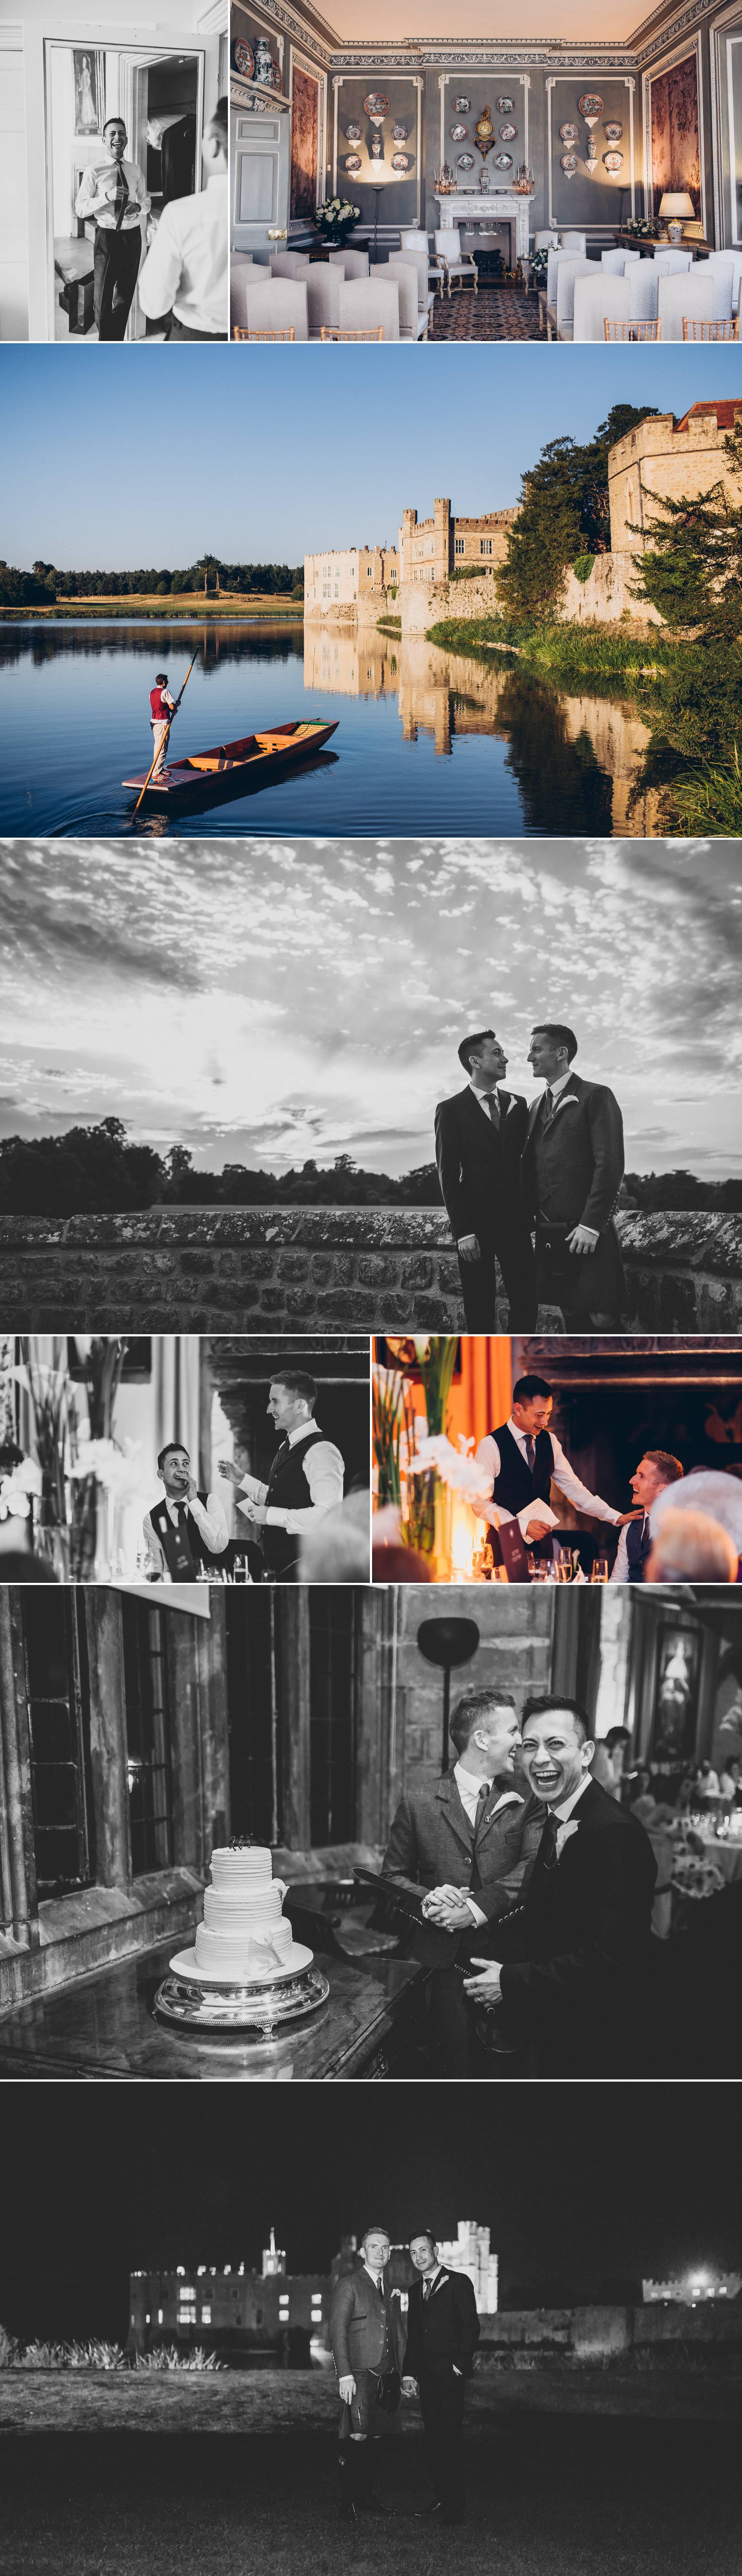 staffordshire-wedding-photographer 37.jpg